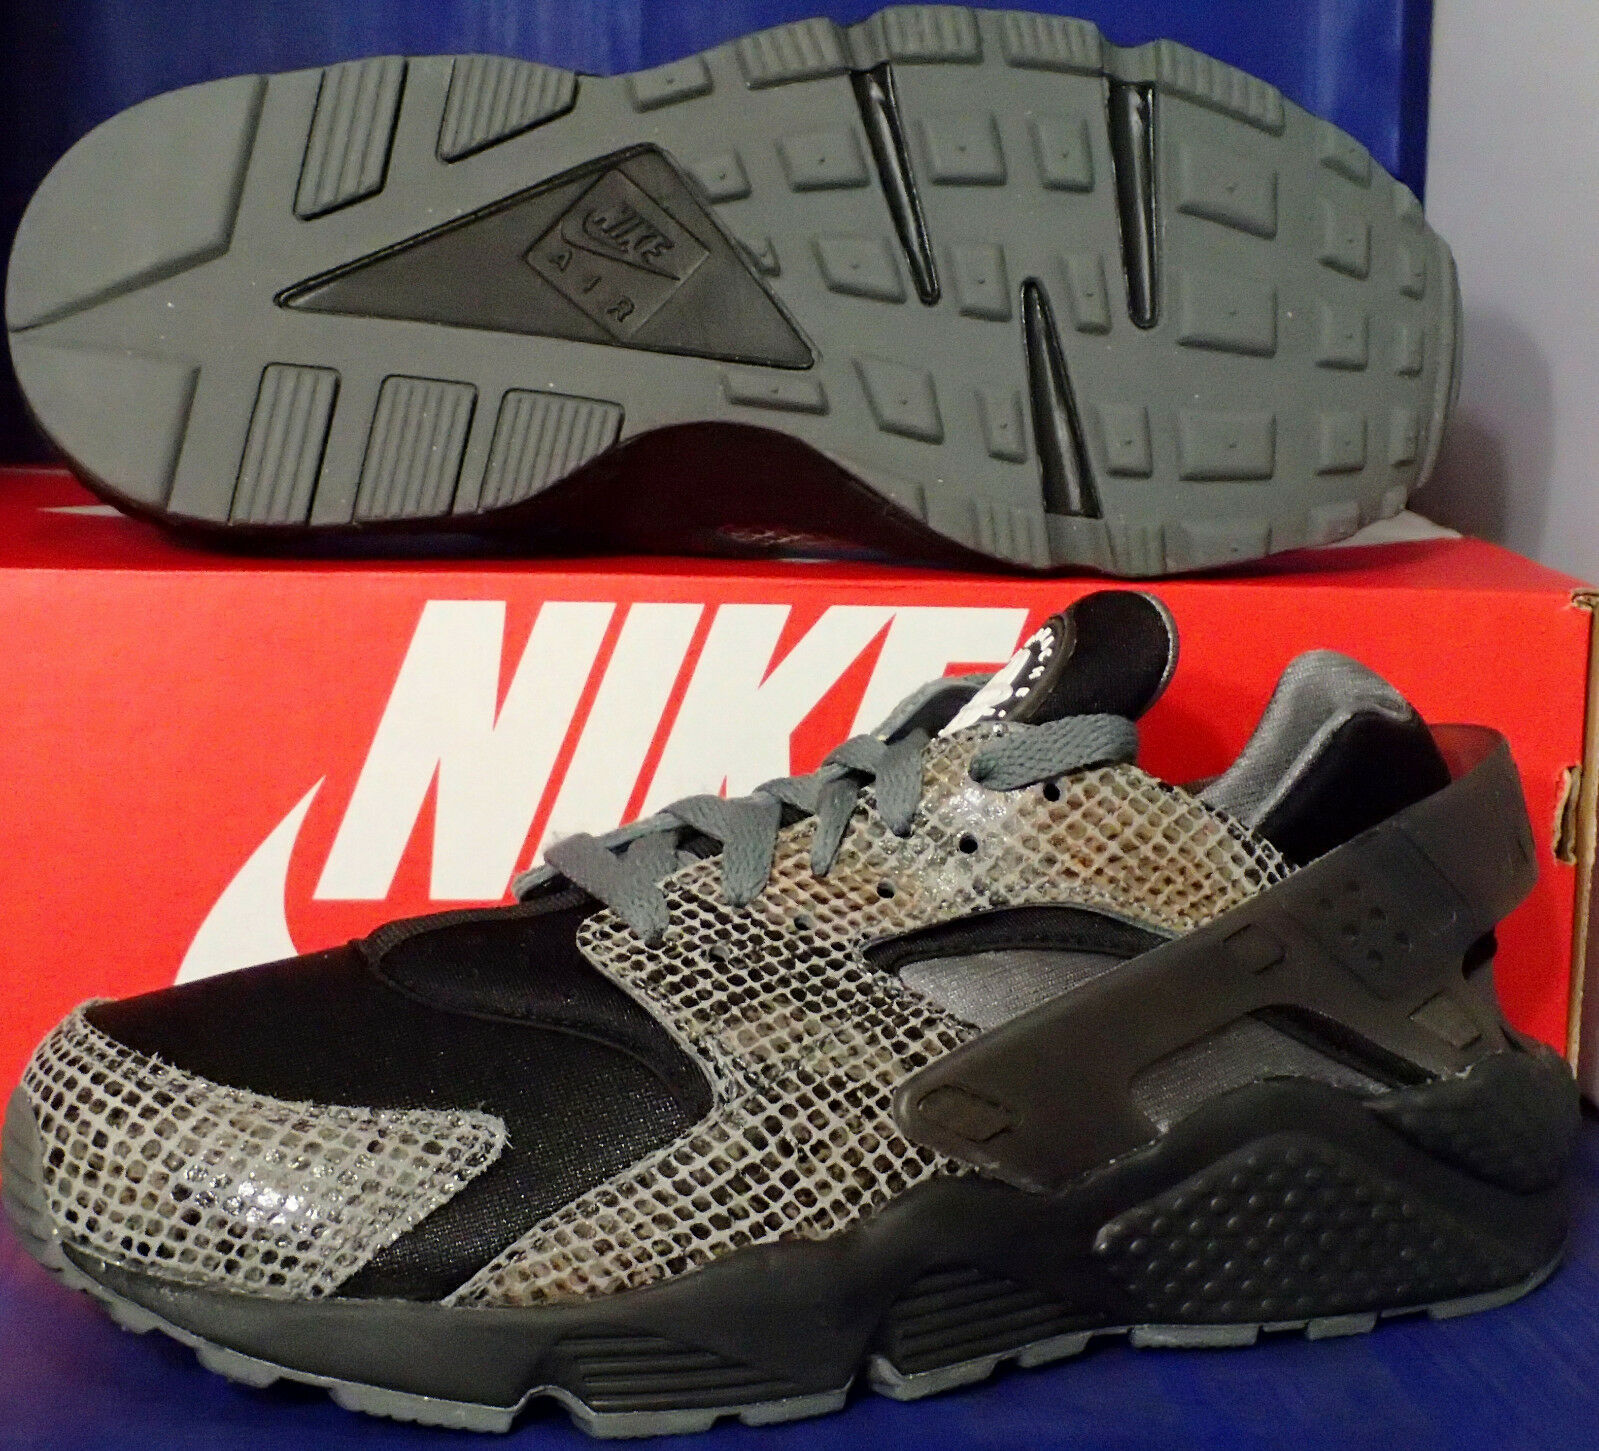 Nike Air Huarache Run iD iD iD Snake Print Cool Grey Black SZ 9.5 ( 777330-993 ) 5de0bc